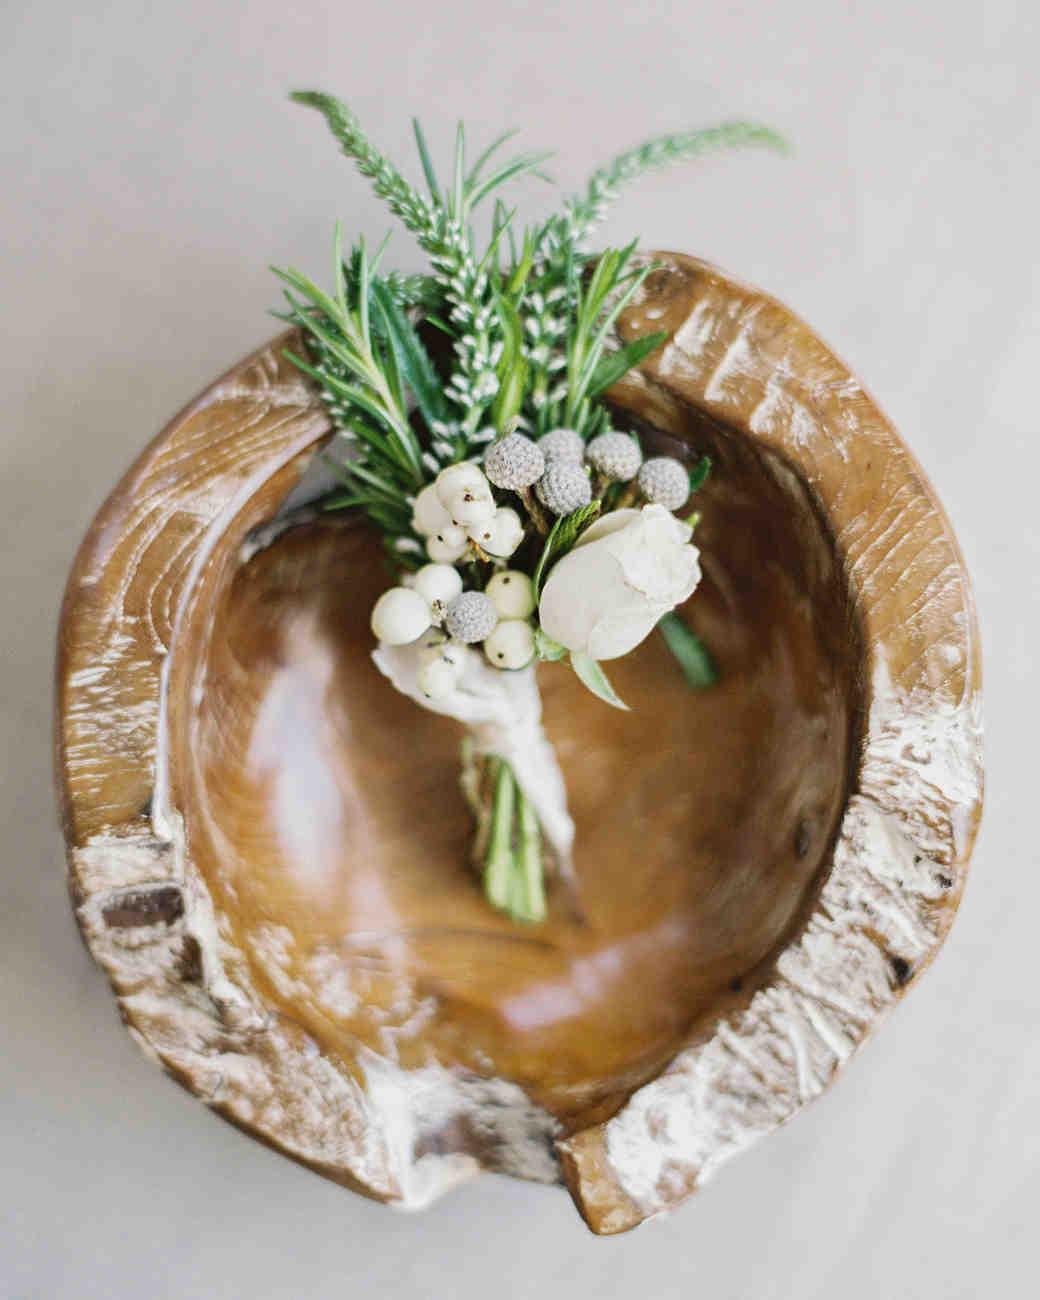 mackenzie-ian-wedding-boutonniere-010-s112461-0116.jpg